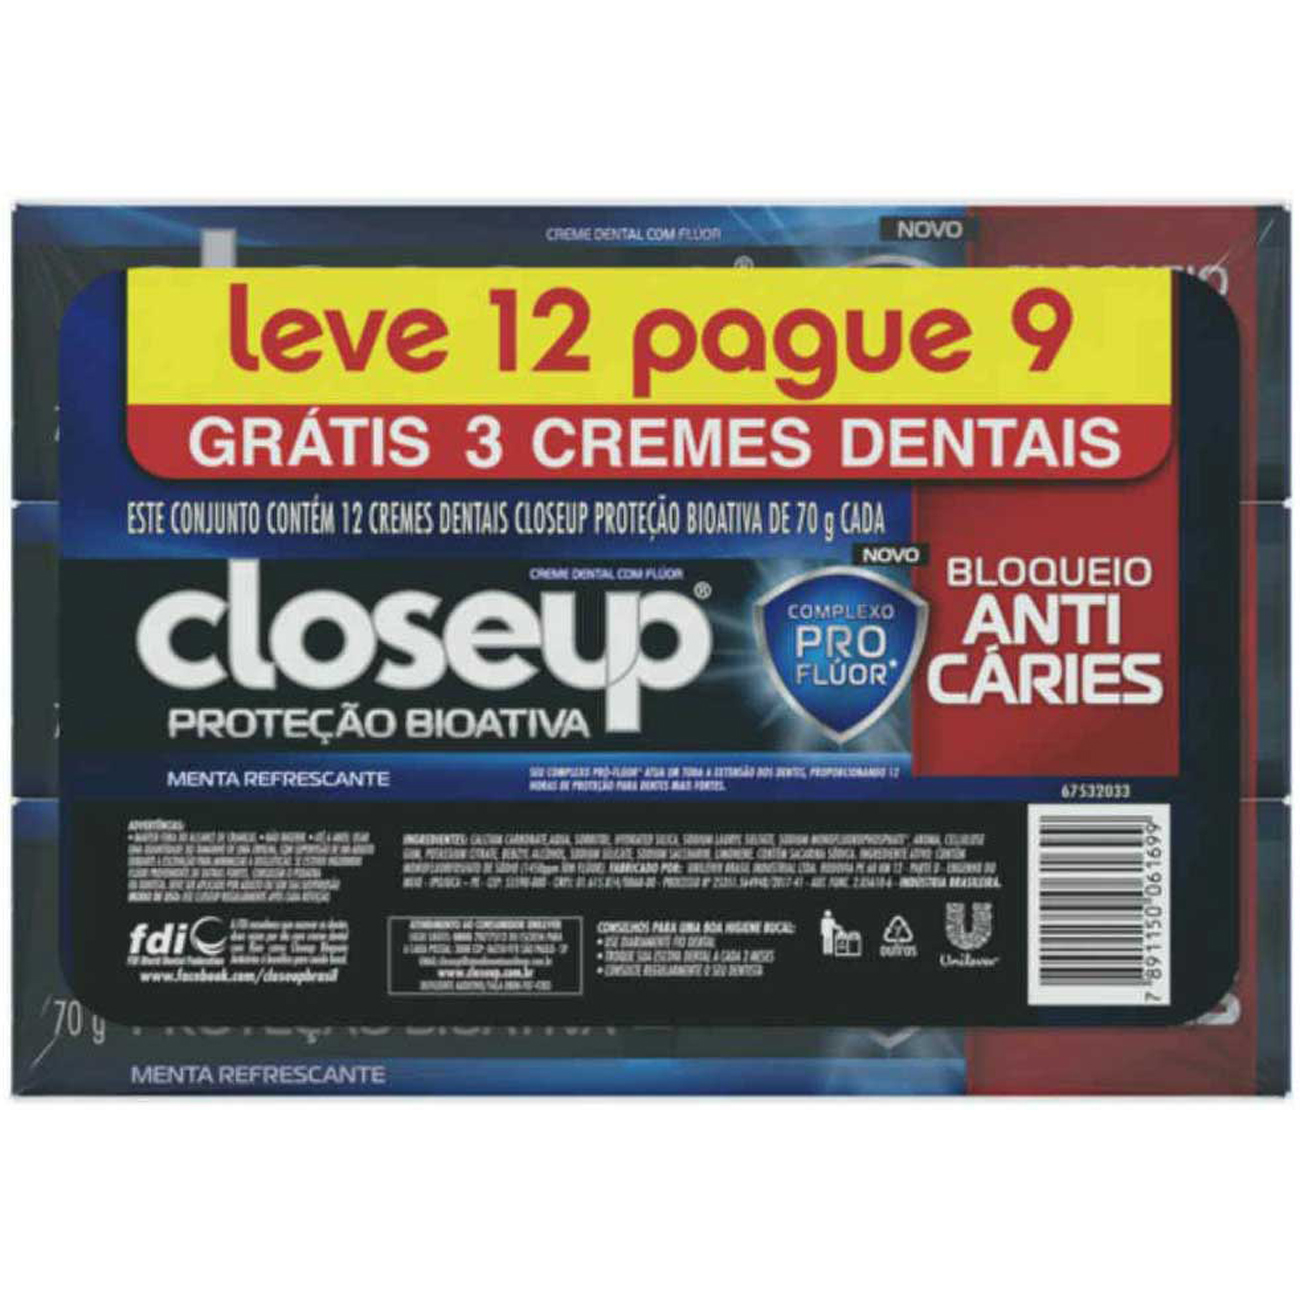 Creme Dental Close Up Protecao Bioativa Anticare leve 12 pague 9 70g